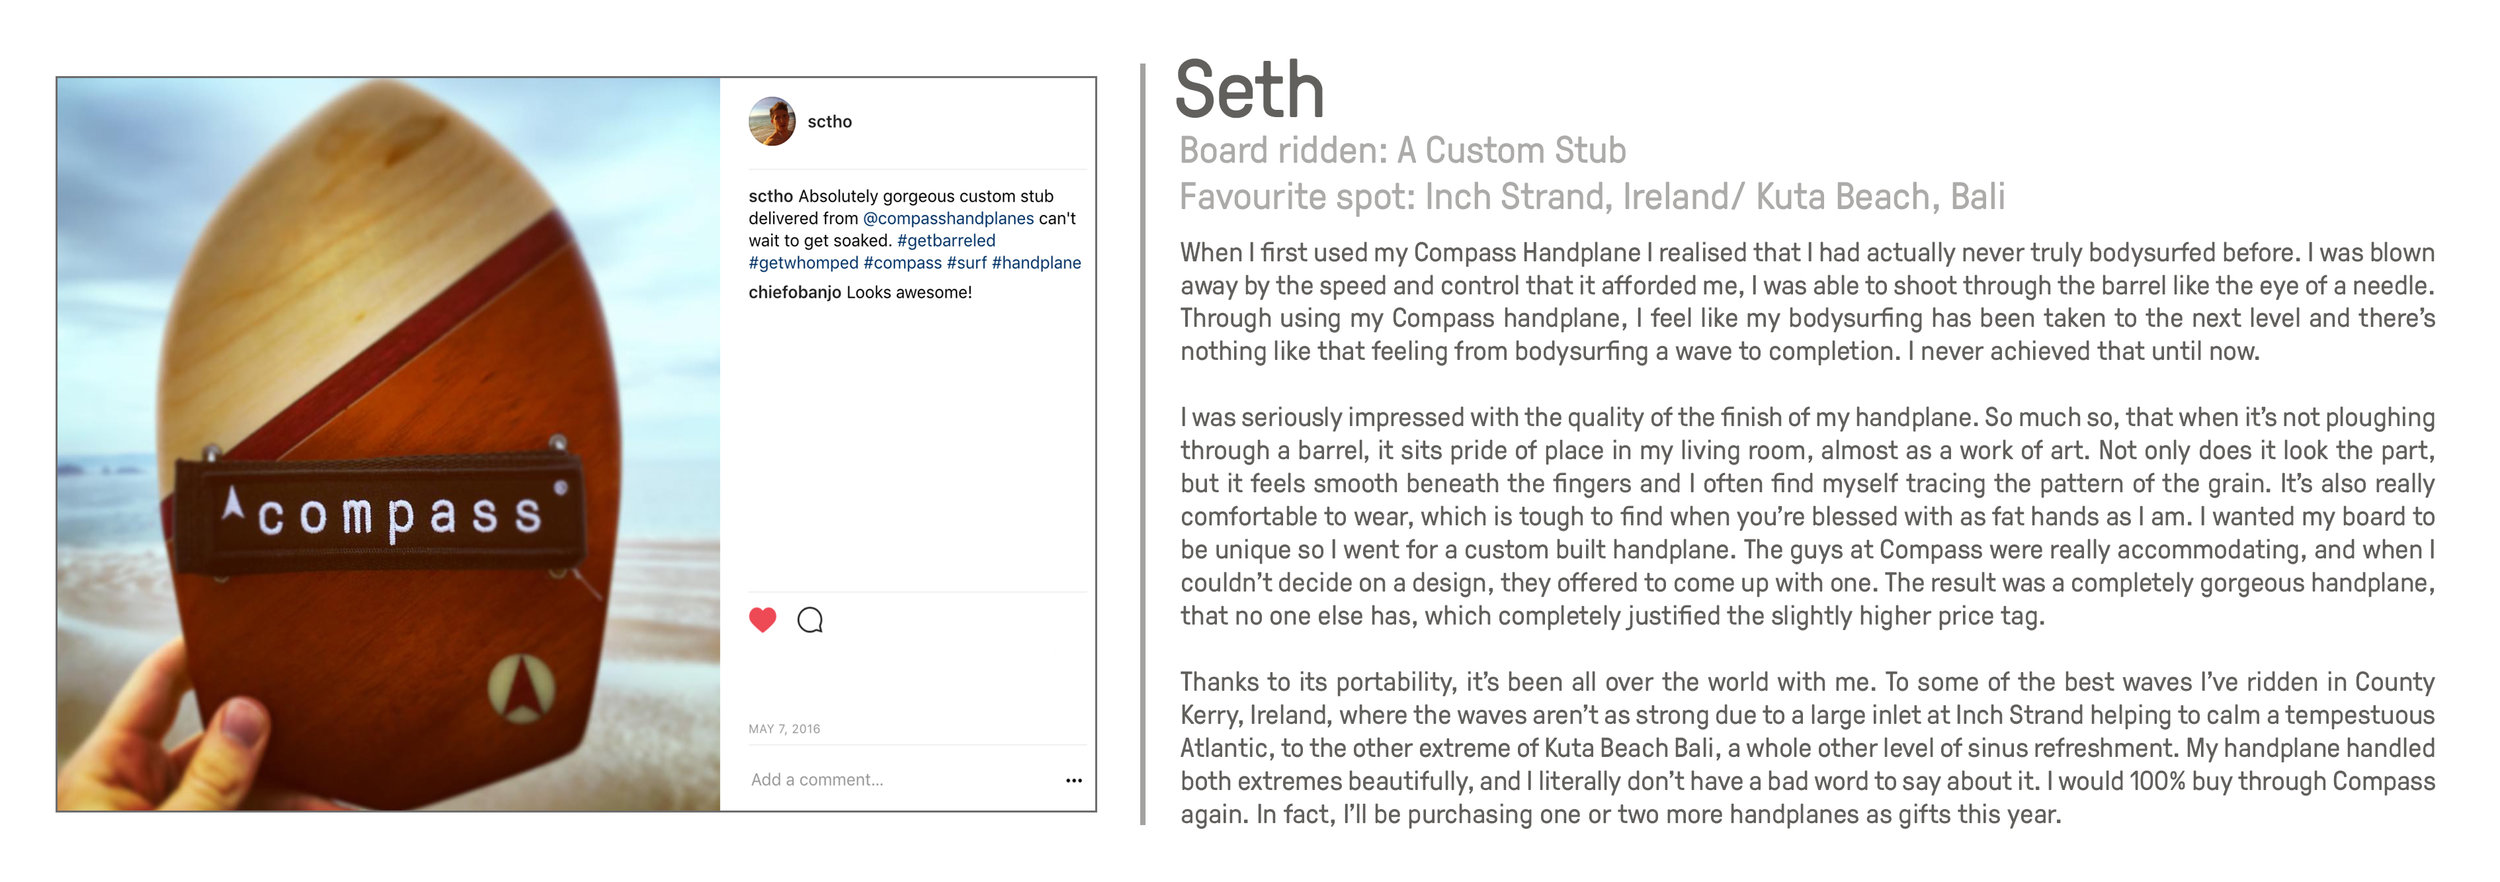 Ash customer Compass Handplanes bodysurfing great review reviews